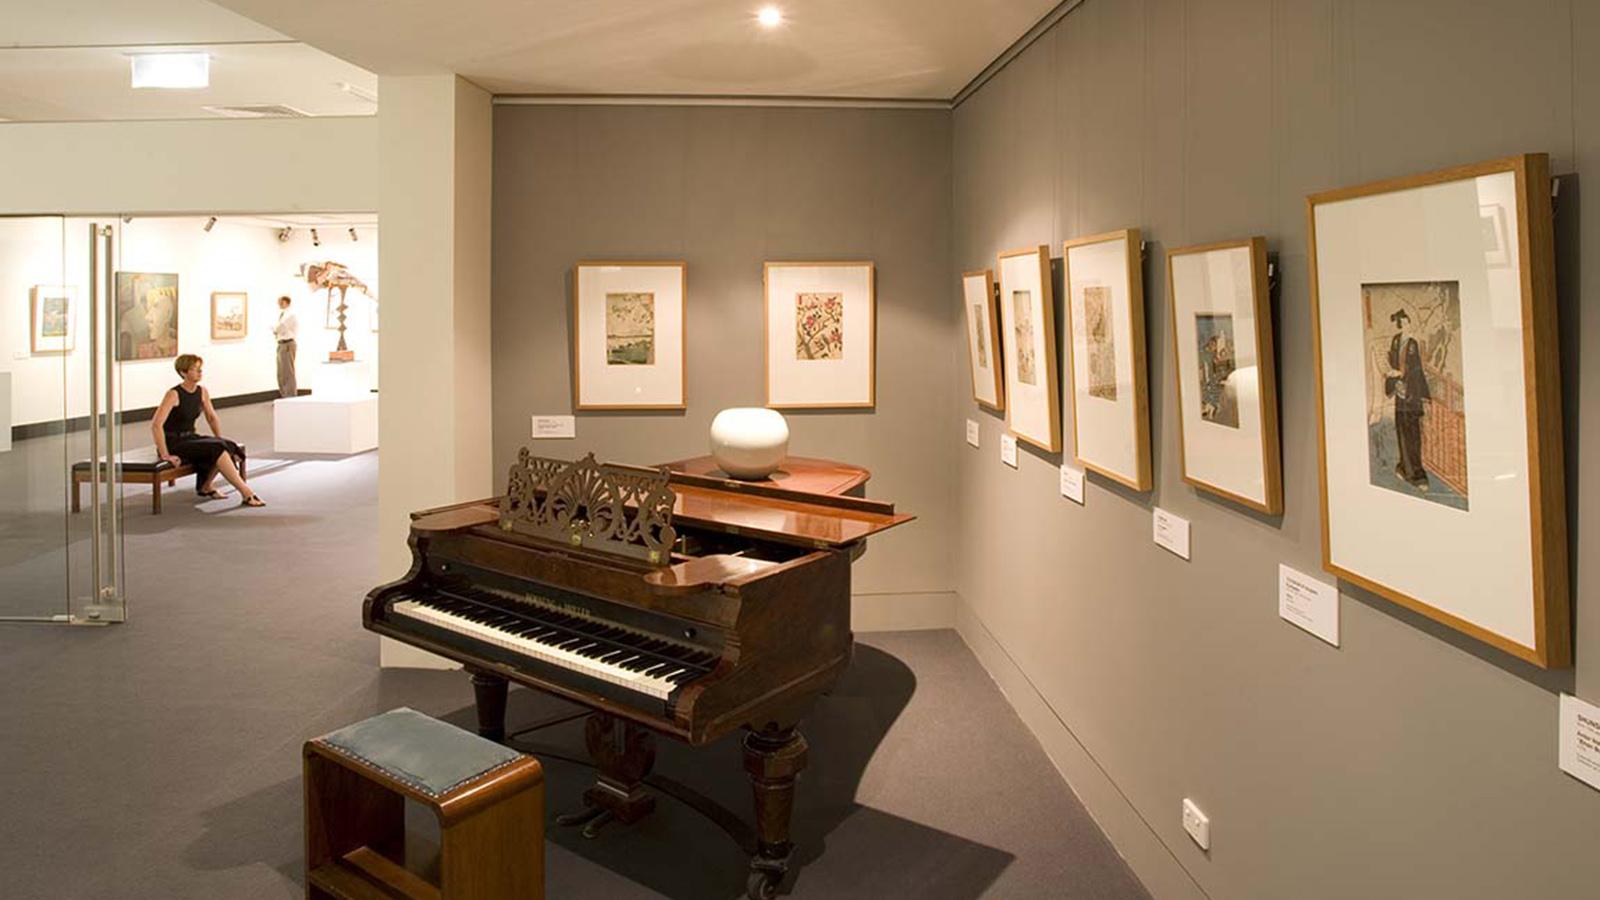 Latrobe Regional Gallery, Morwell, Gippsland, Victoria, Australia